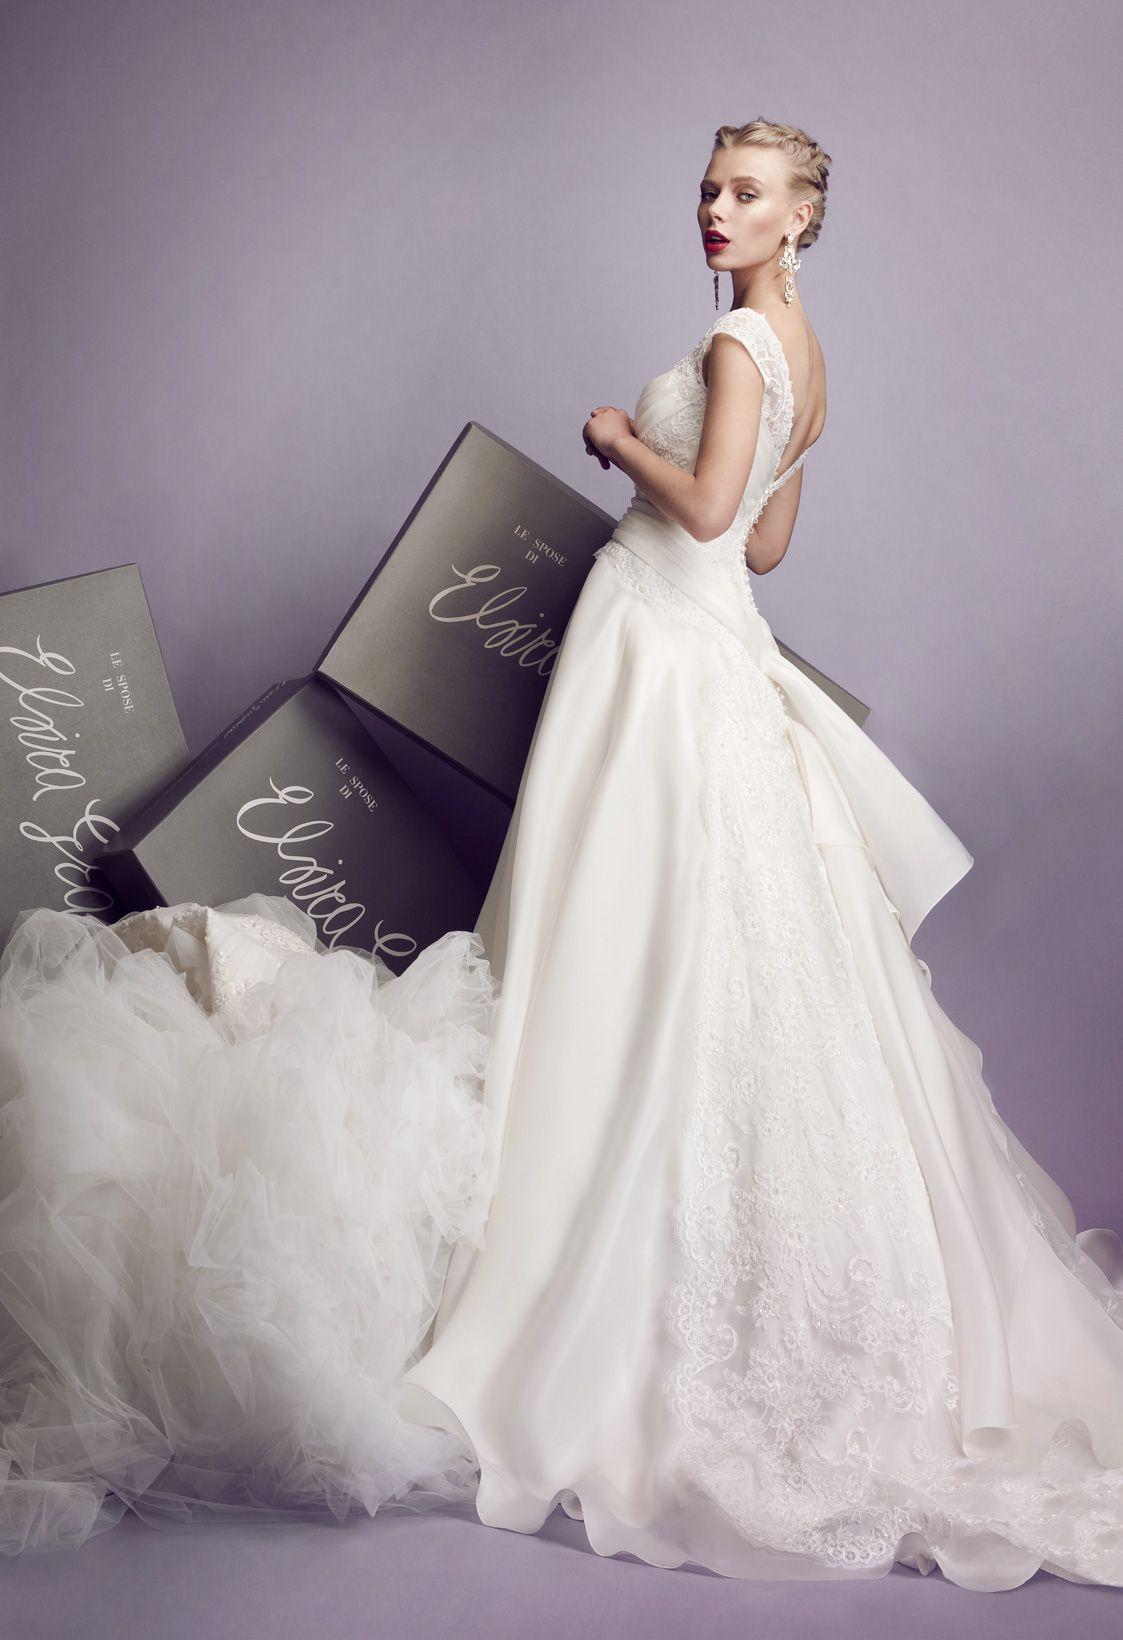 Abiti Da Sposa Elvira Gramano.Elvira Gramano Wedding Dresses Dresses Wedding